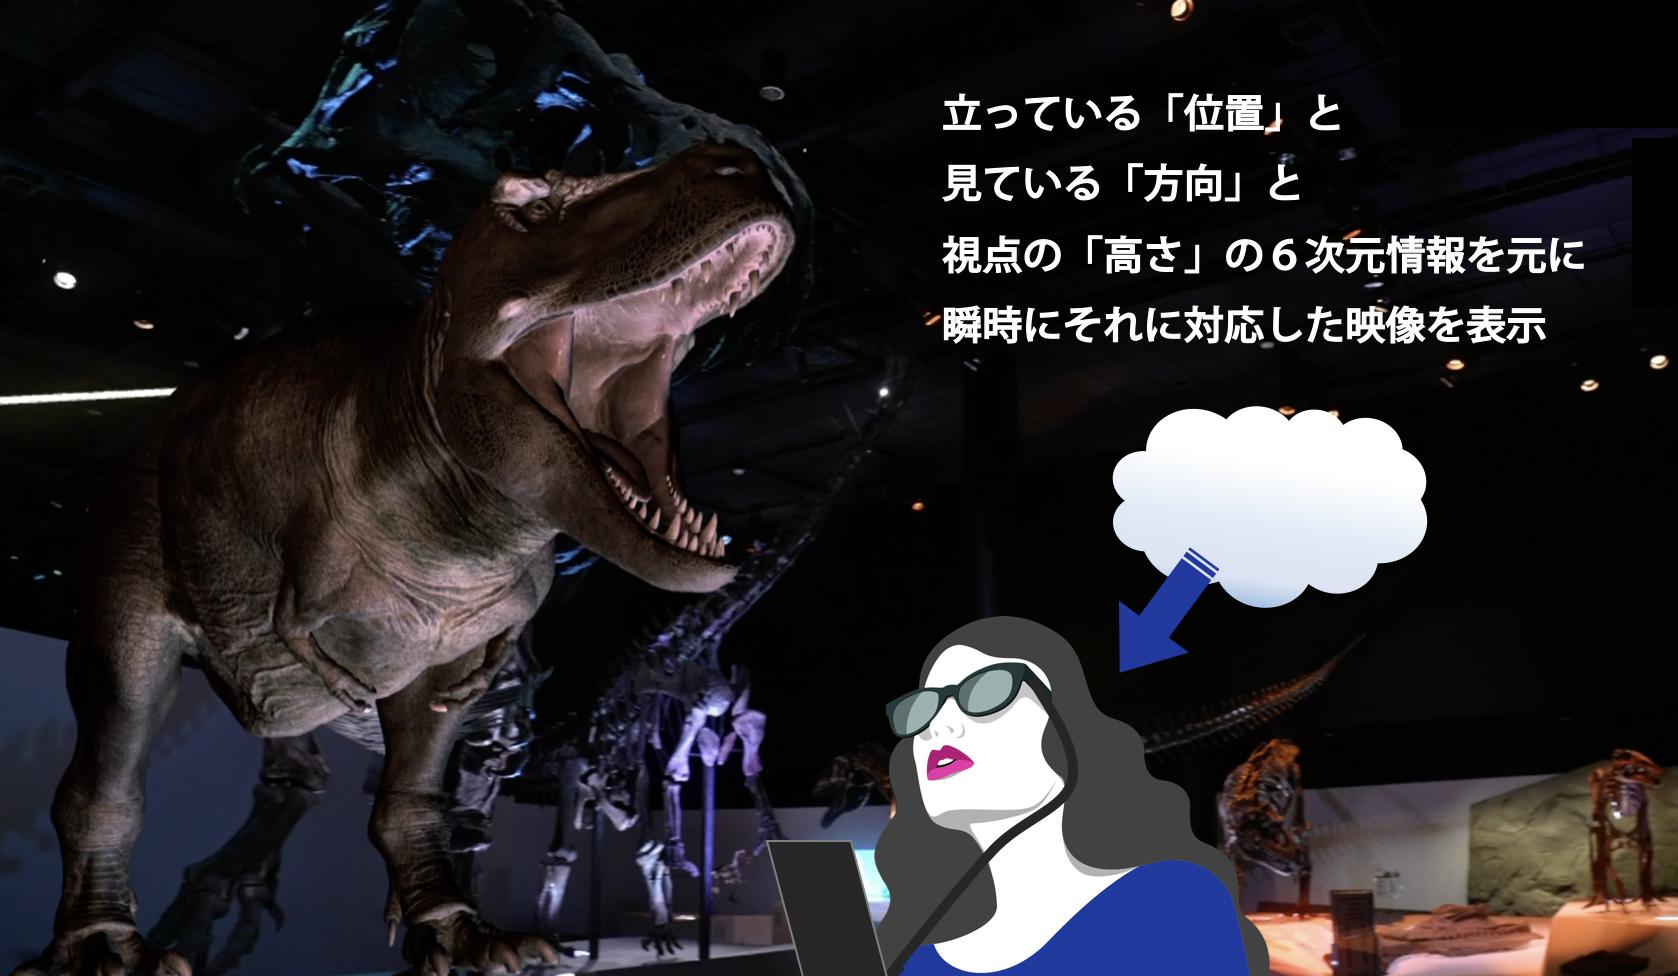 auの5G通信と「AWS Wavelength」を活用したスマートグラスでの恐竜映像視聴の仕組み